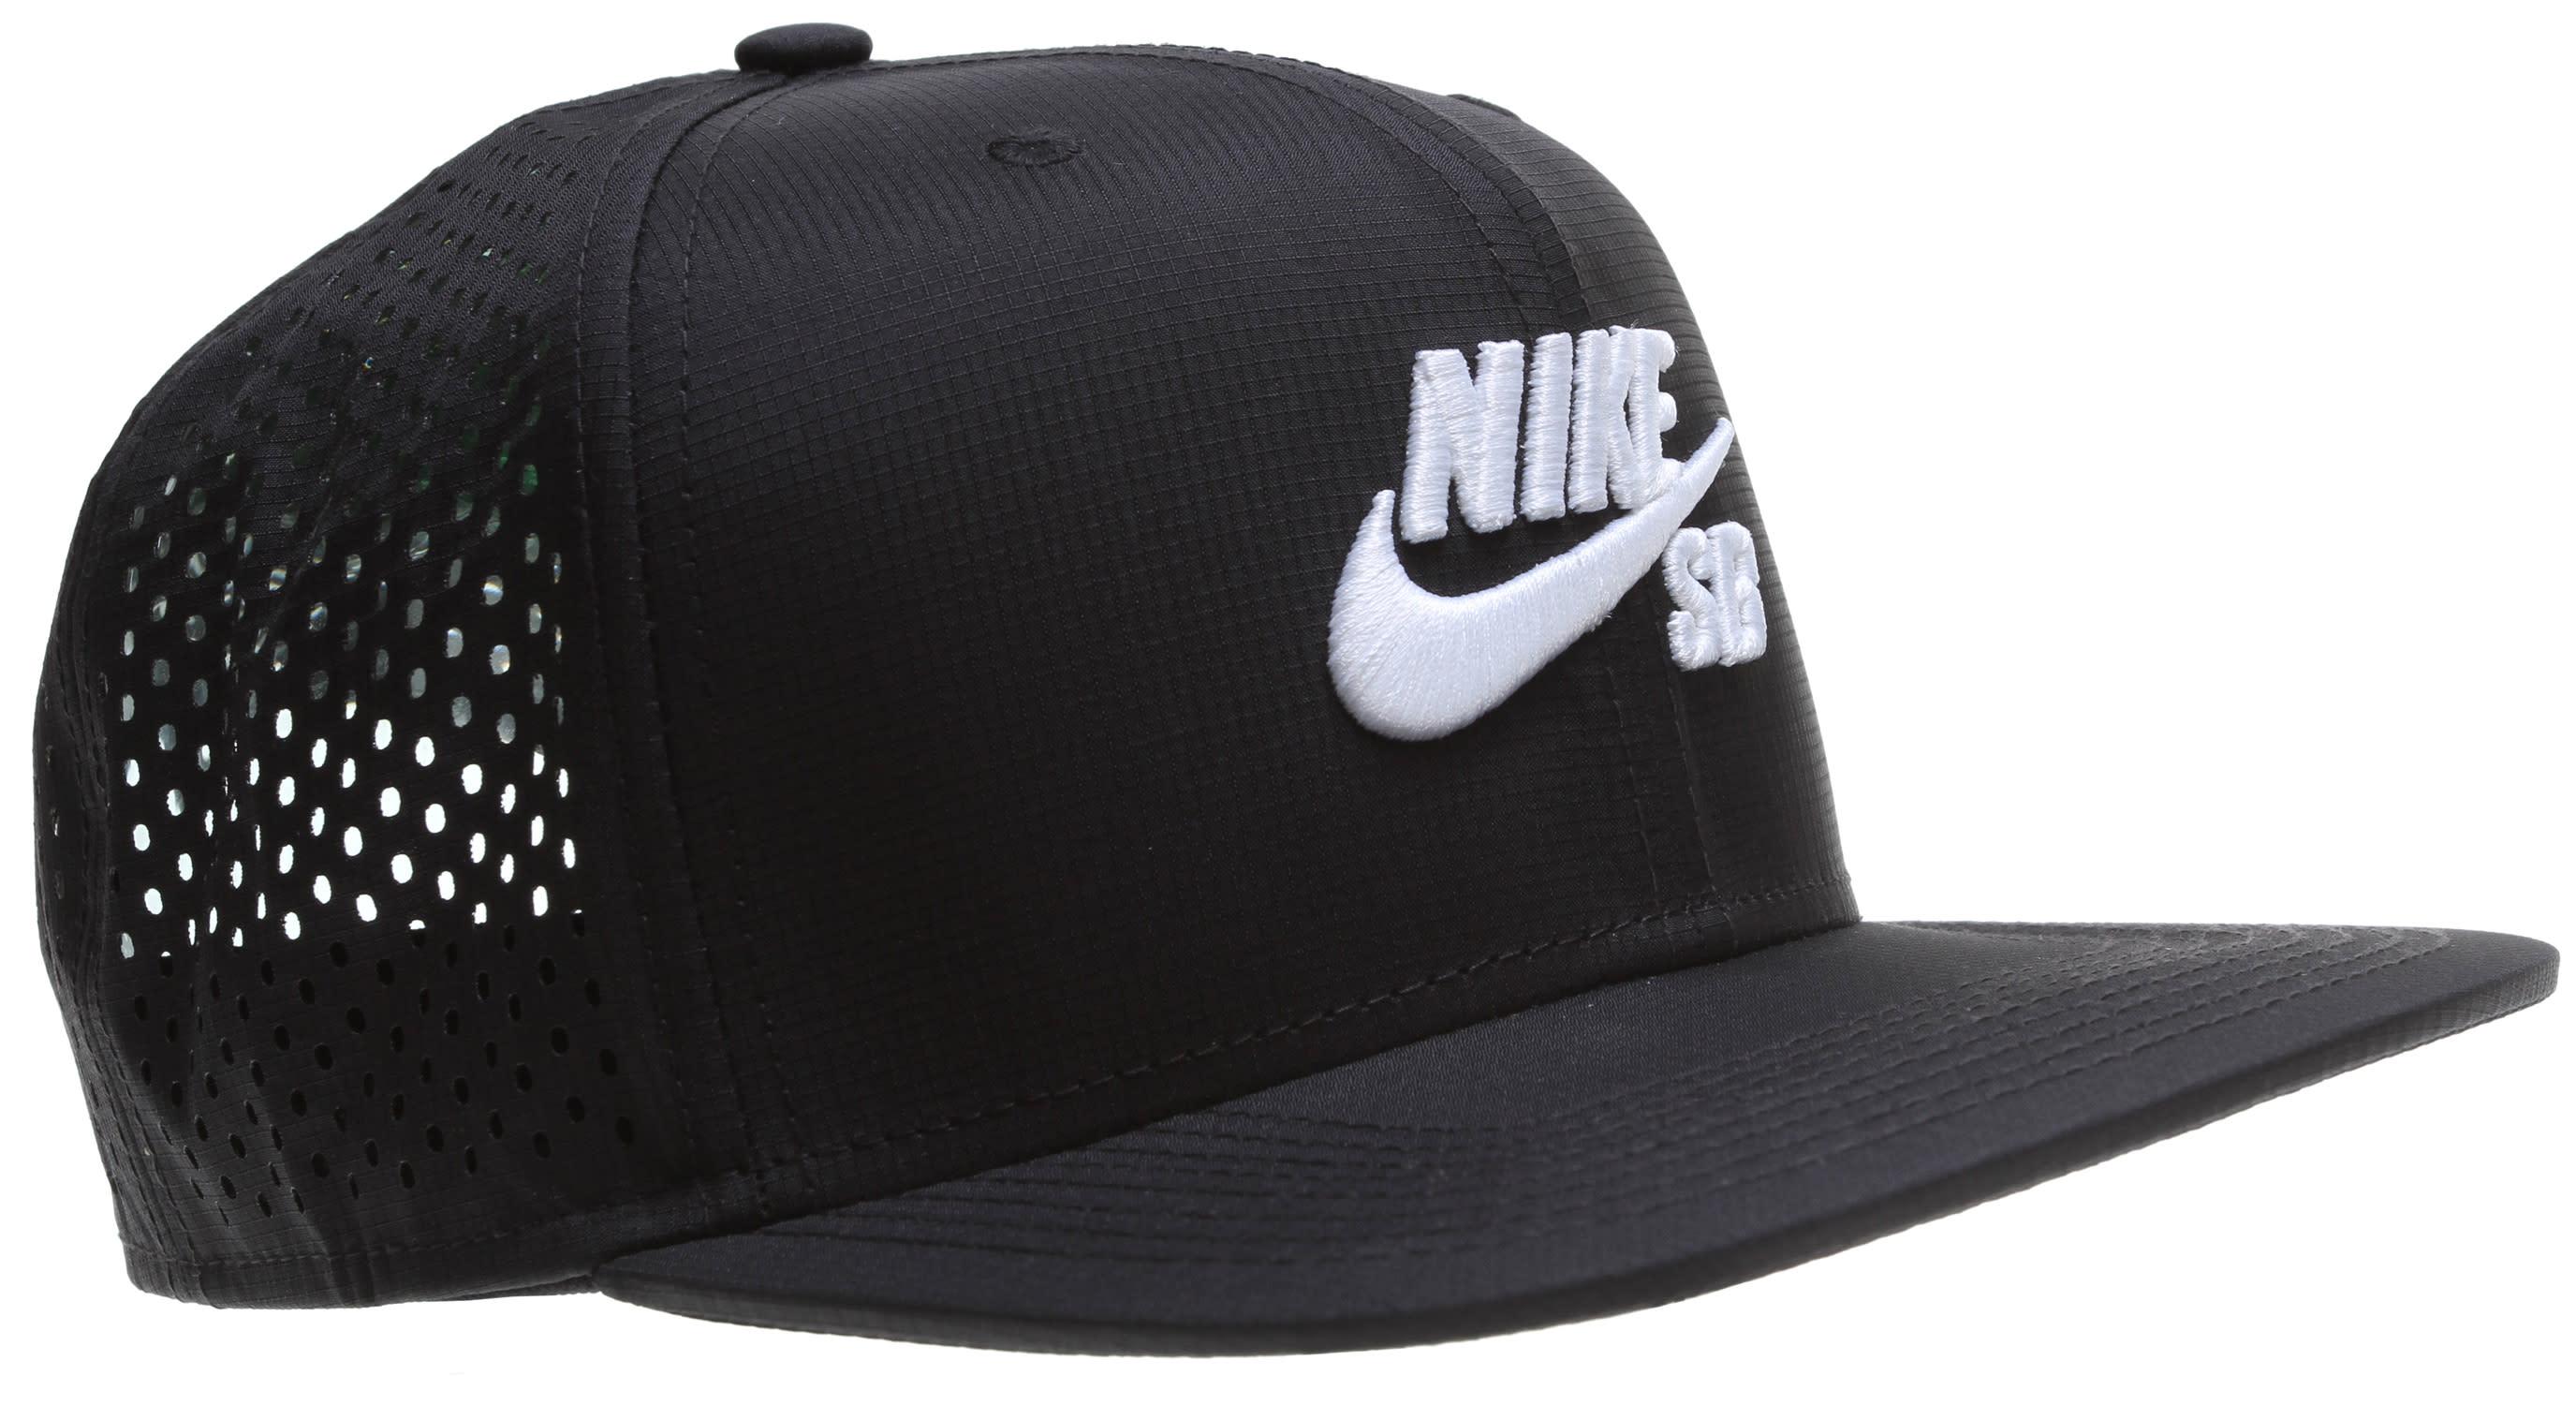 a34ec30c970 Nike SB Performance Trucker Cap - thumbnail 2